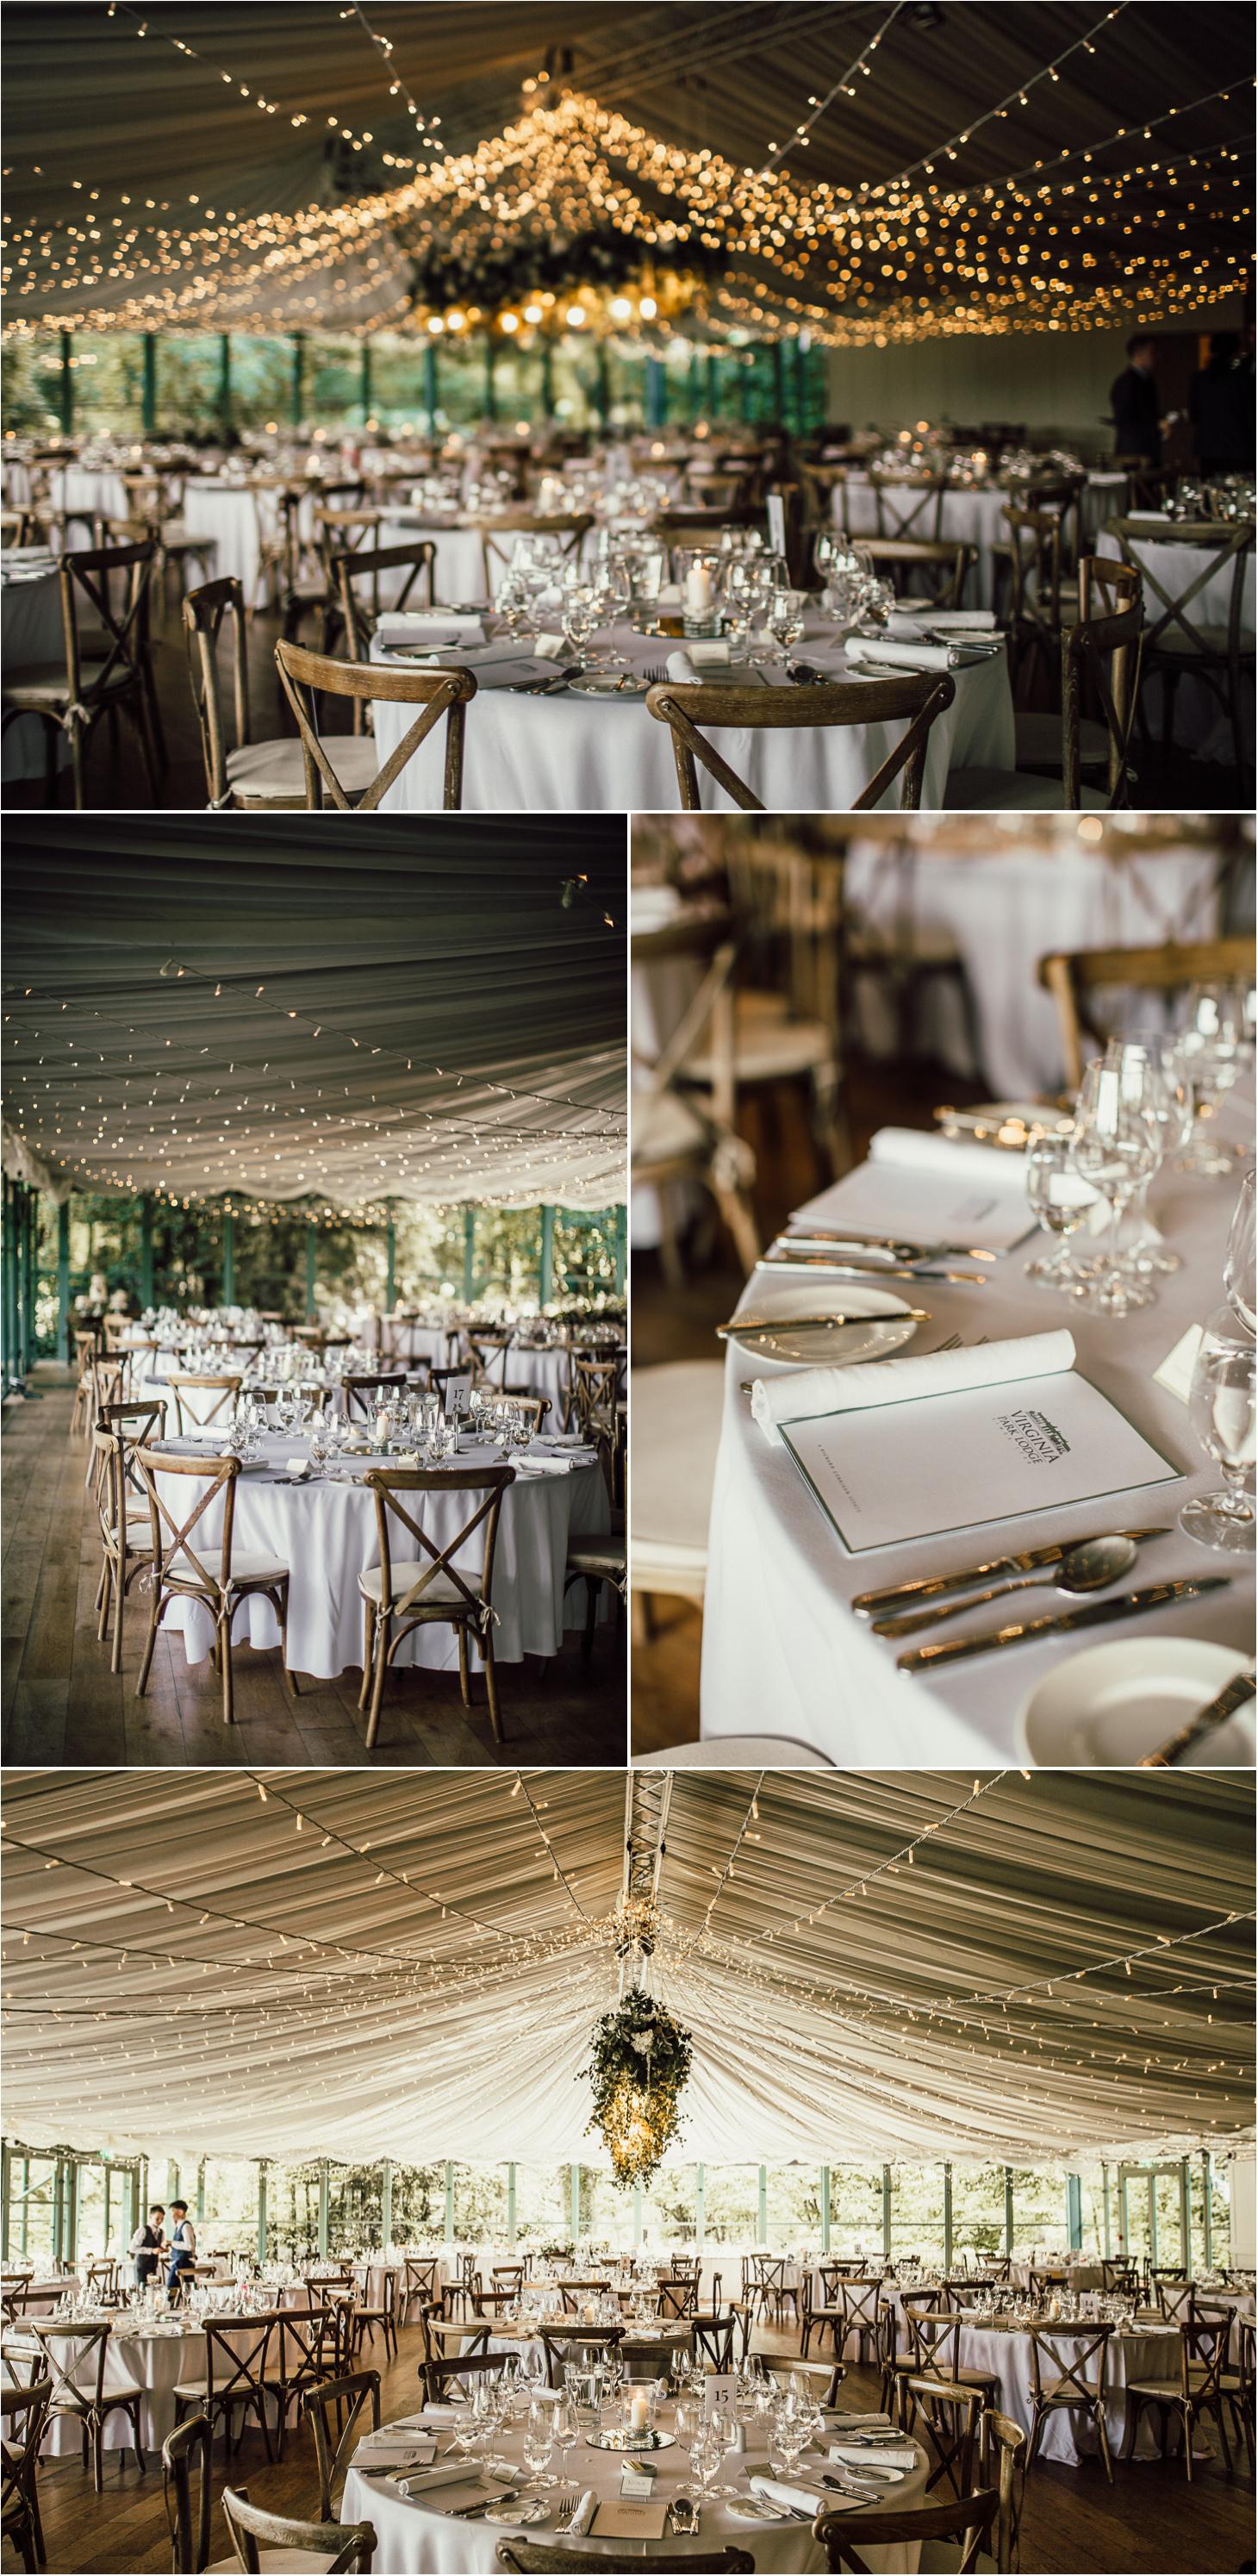 Virgina Lodge Photography. darren fitzpatrick. Wedding.23